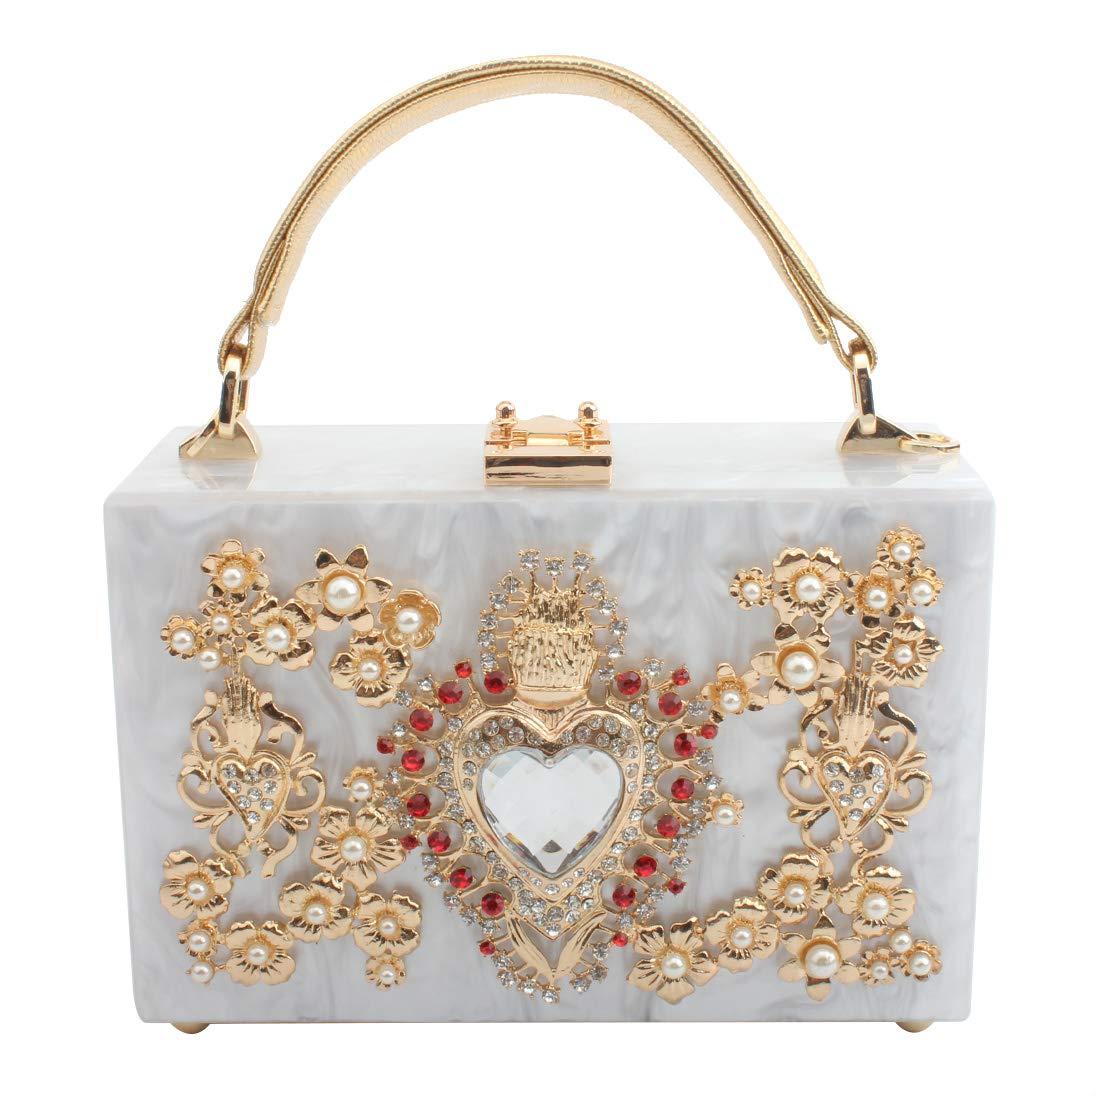 LETODE Women' Sparkling Crystal Clutch Purse Elegant Acrylic Evening Bags Wedding Party Handbag Pursey (WHITE)